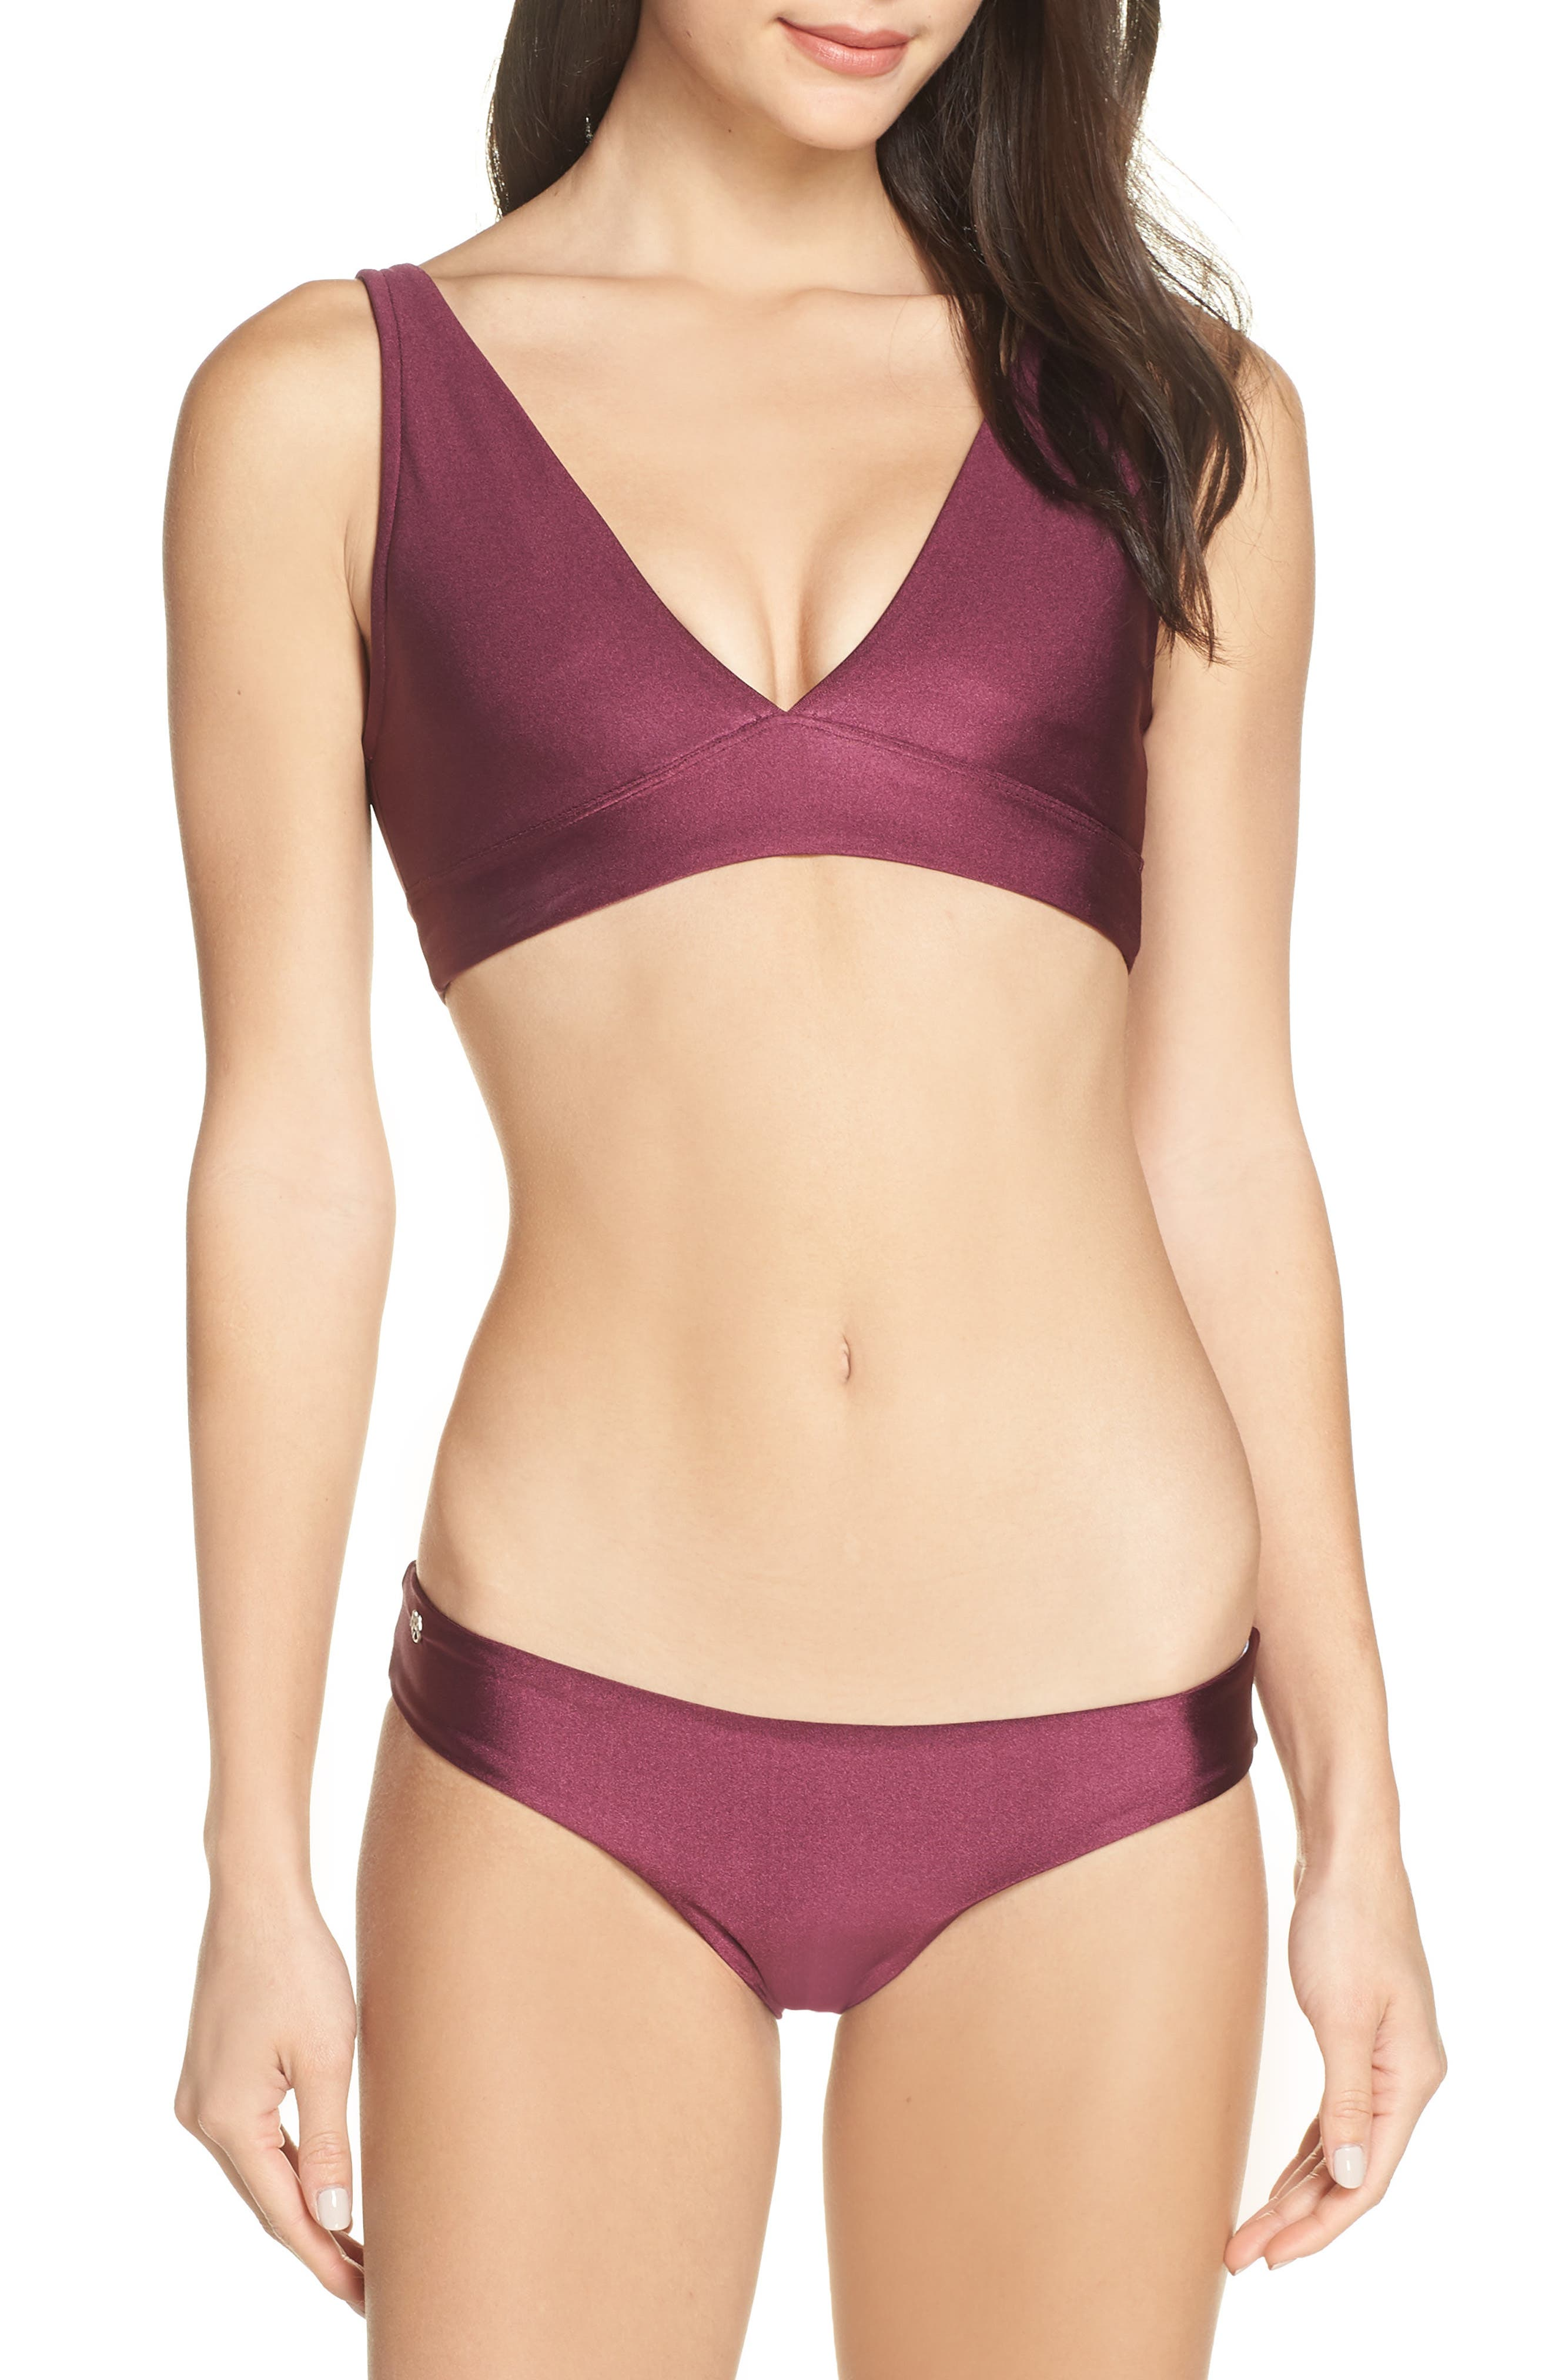 Beach Plum Sublime Reversible Bikini Bottoms,                             Alternate thumbnail 8, color,                             BEACH PLUM